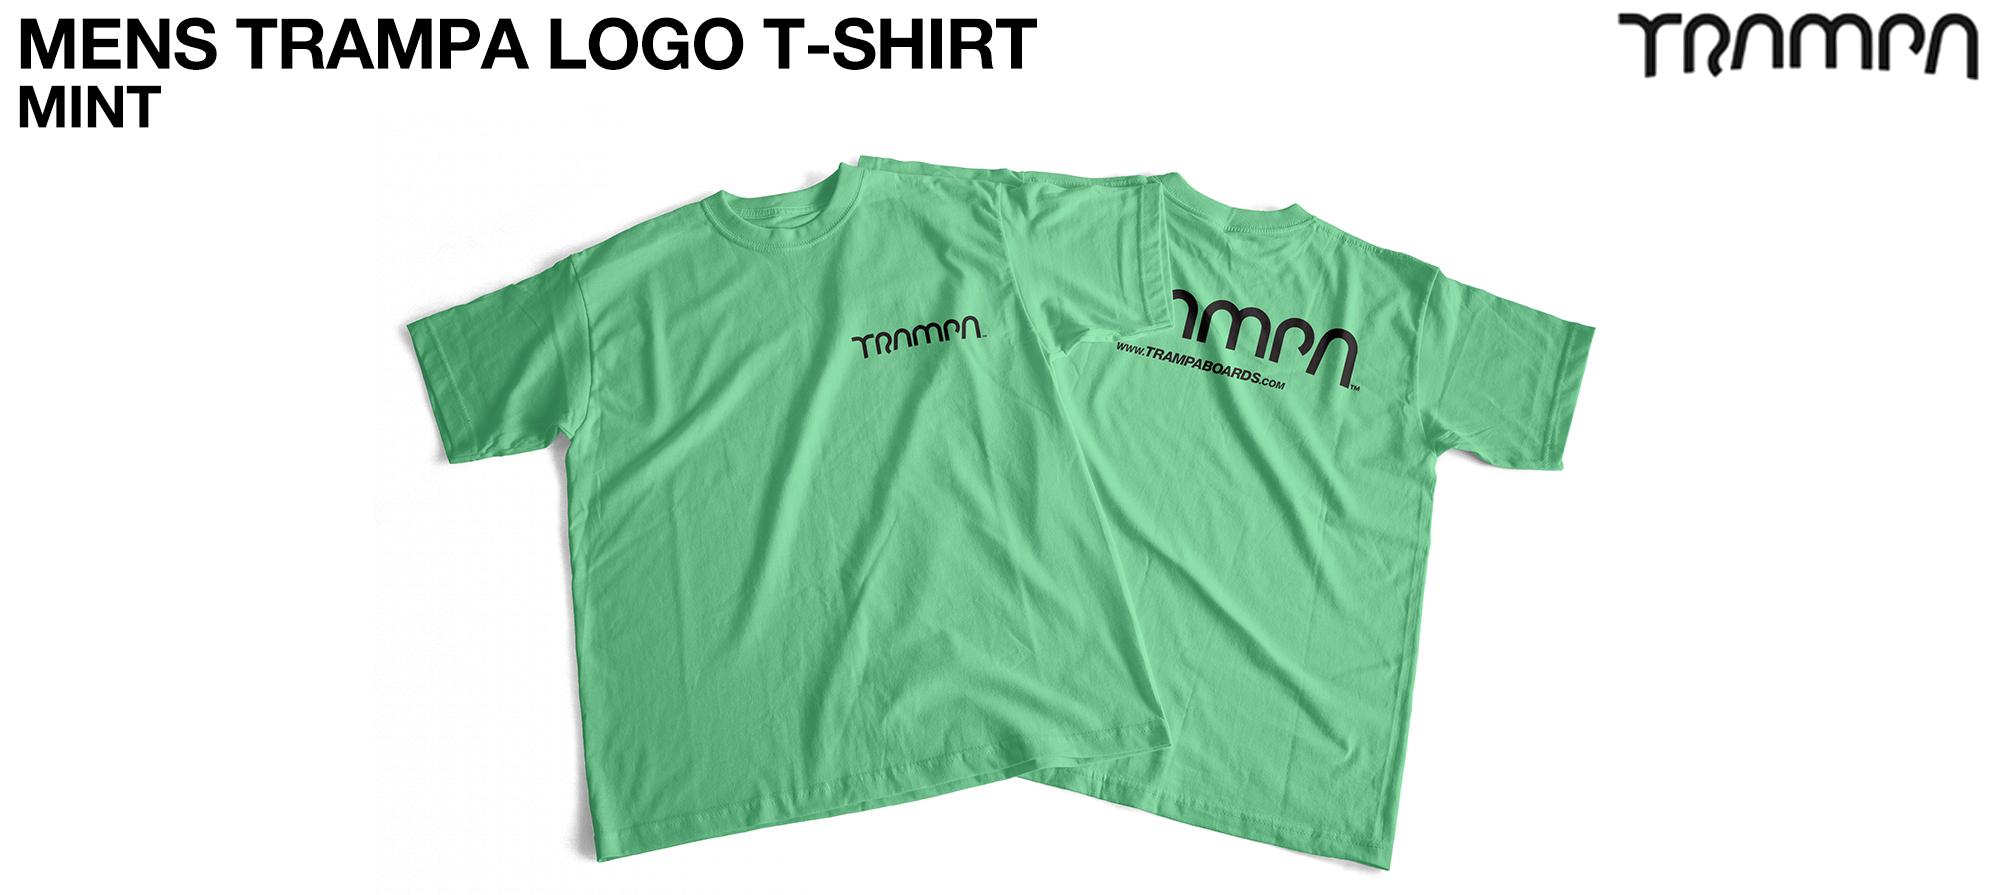 Gildan T  TRAMPA LOGO Mint - CUSTOM (COPY)